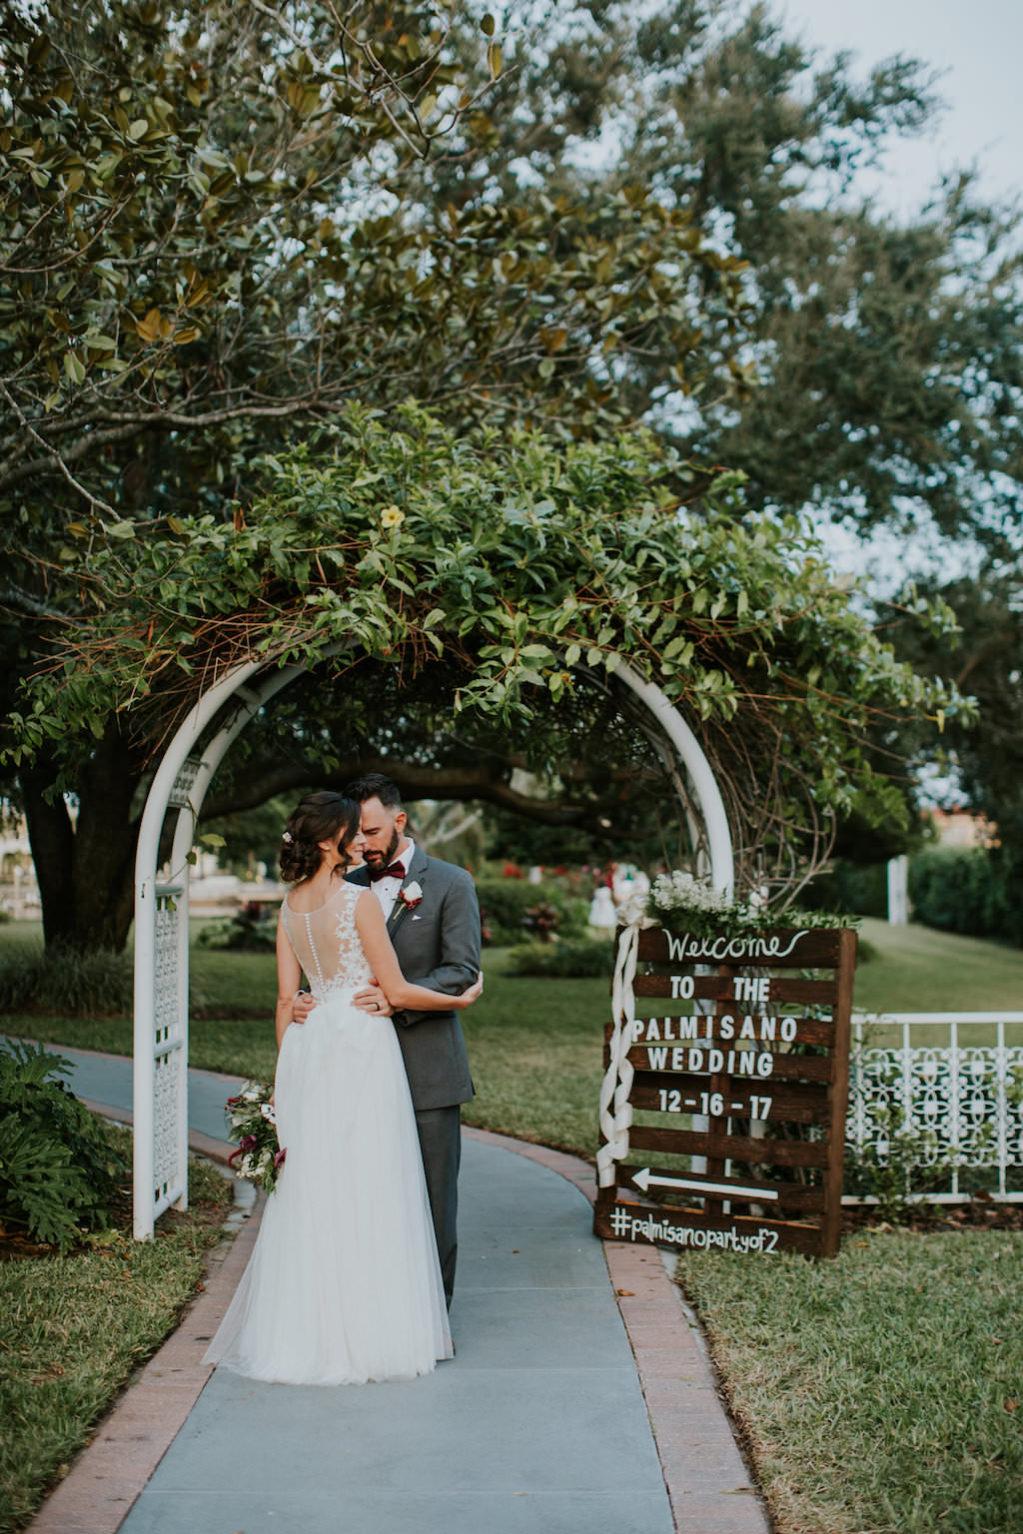 Outdoor Bride and Groom Wedding Portrait. White Arch and Rustic Wooden Crate Sign | Tampa Bay Wedding Venue Davis Islands Garden Club